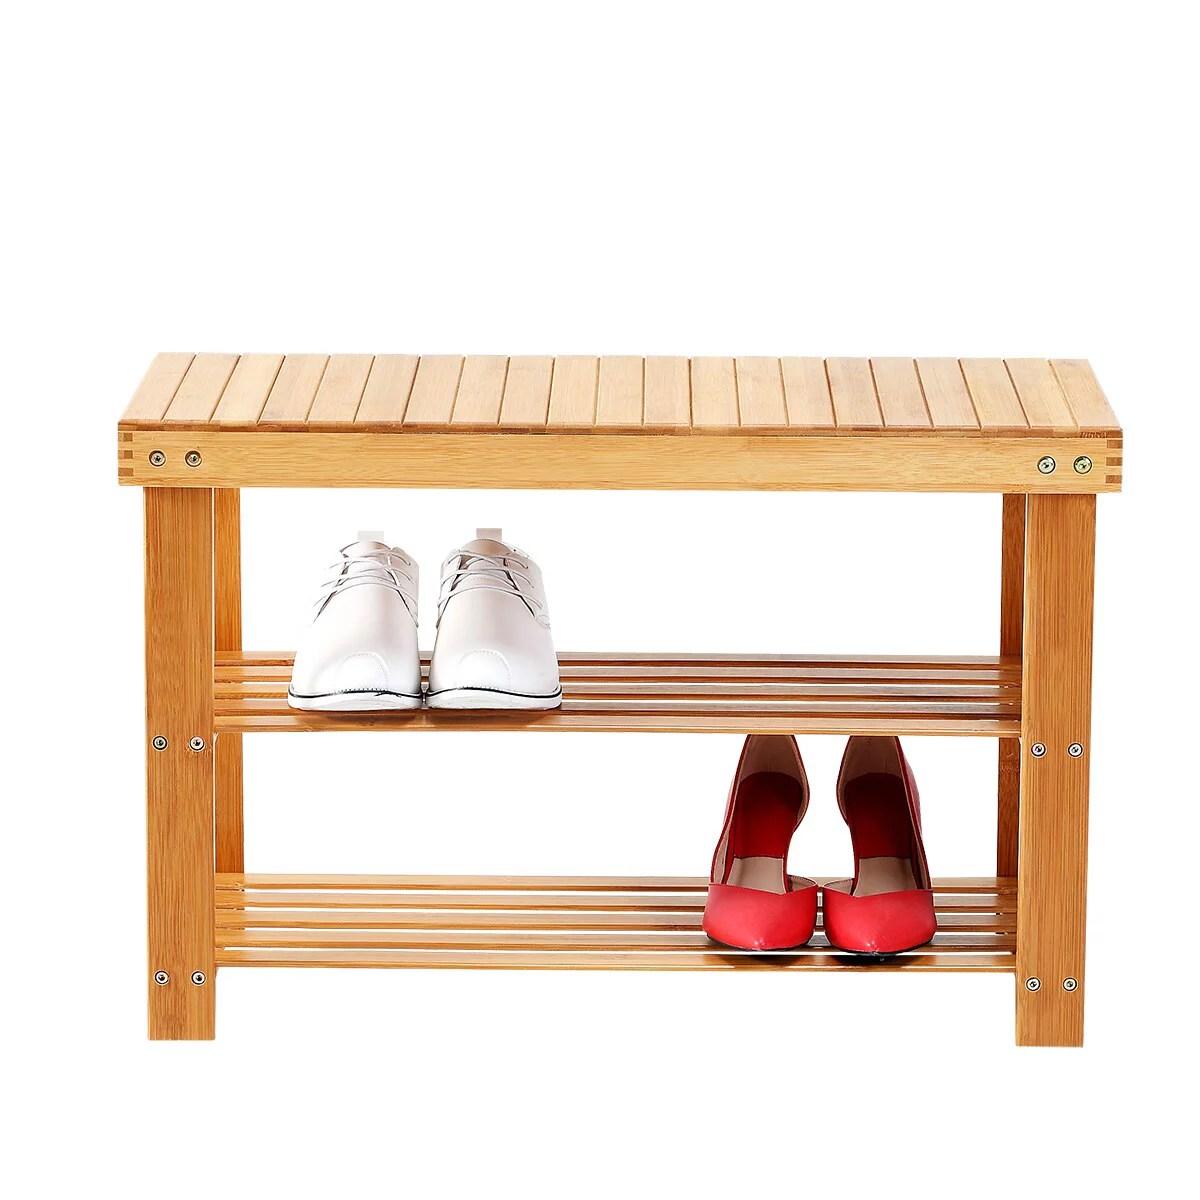 new ridge home goods natural bamboo shoe rack bench 2 tier shoe organizer entryway seat with storage shelf hallway furniture